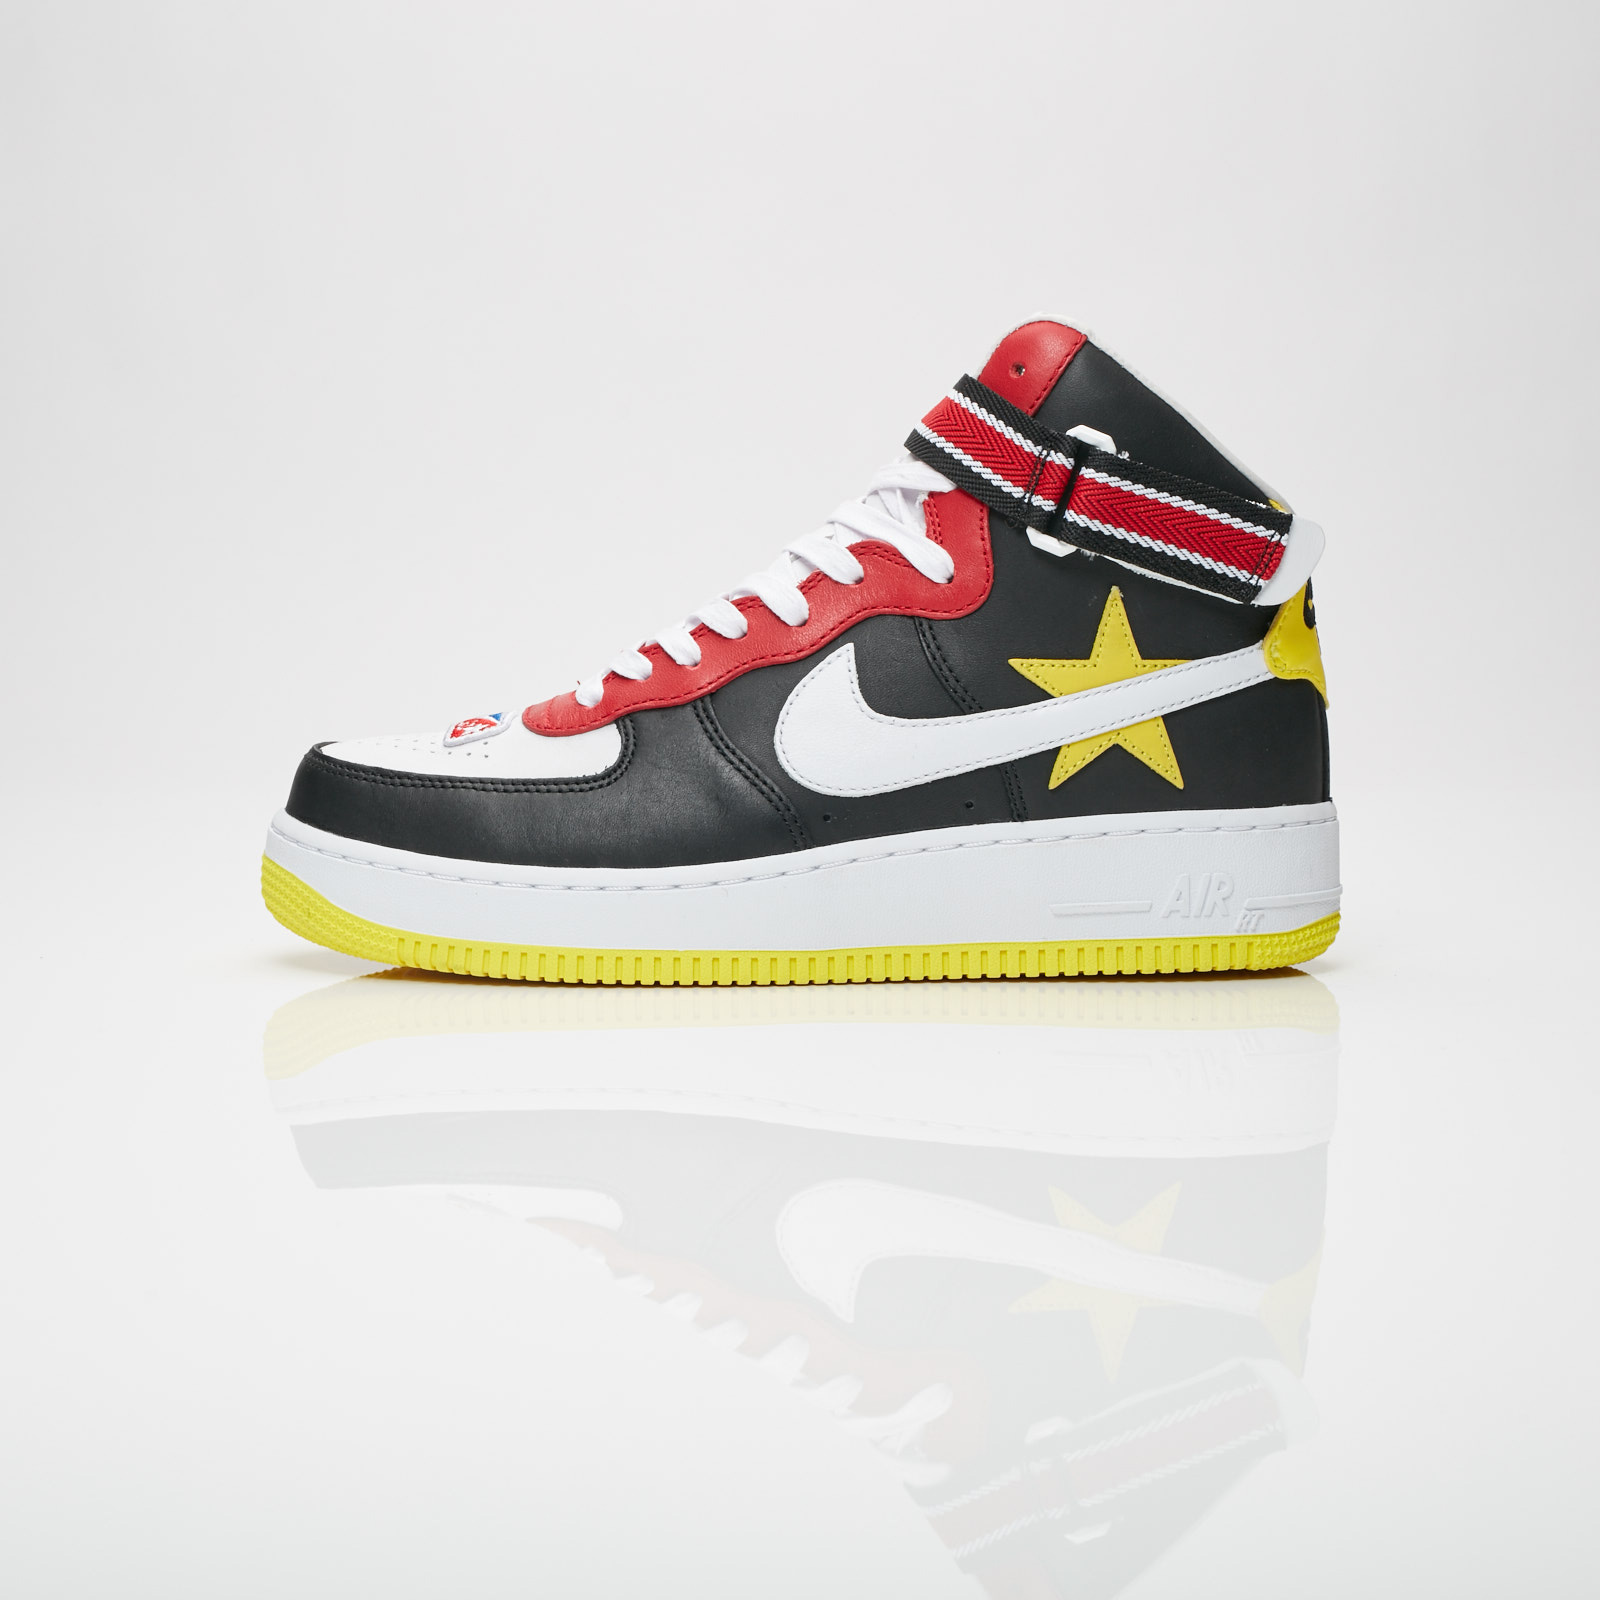 on sale e2343 2f2d2 Nike Air Force 1 Hi x Riccardo Tisci - Aq3366-600 - Sneakersnstuff ...